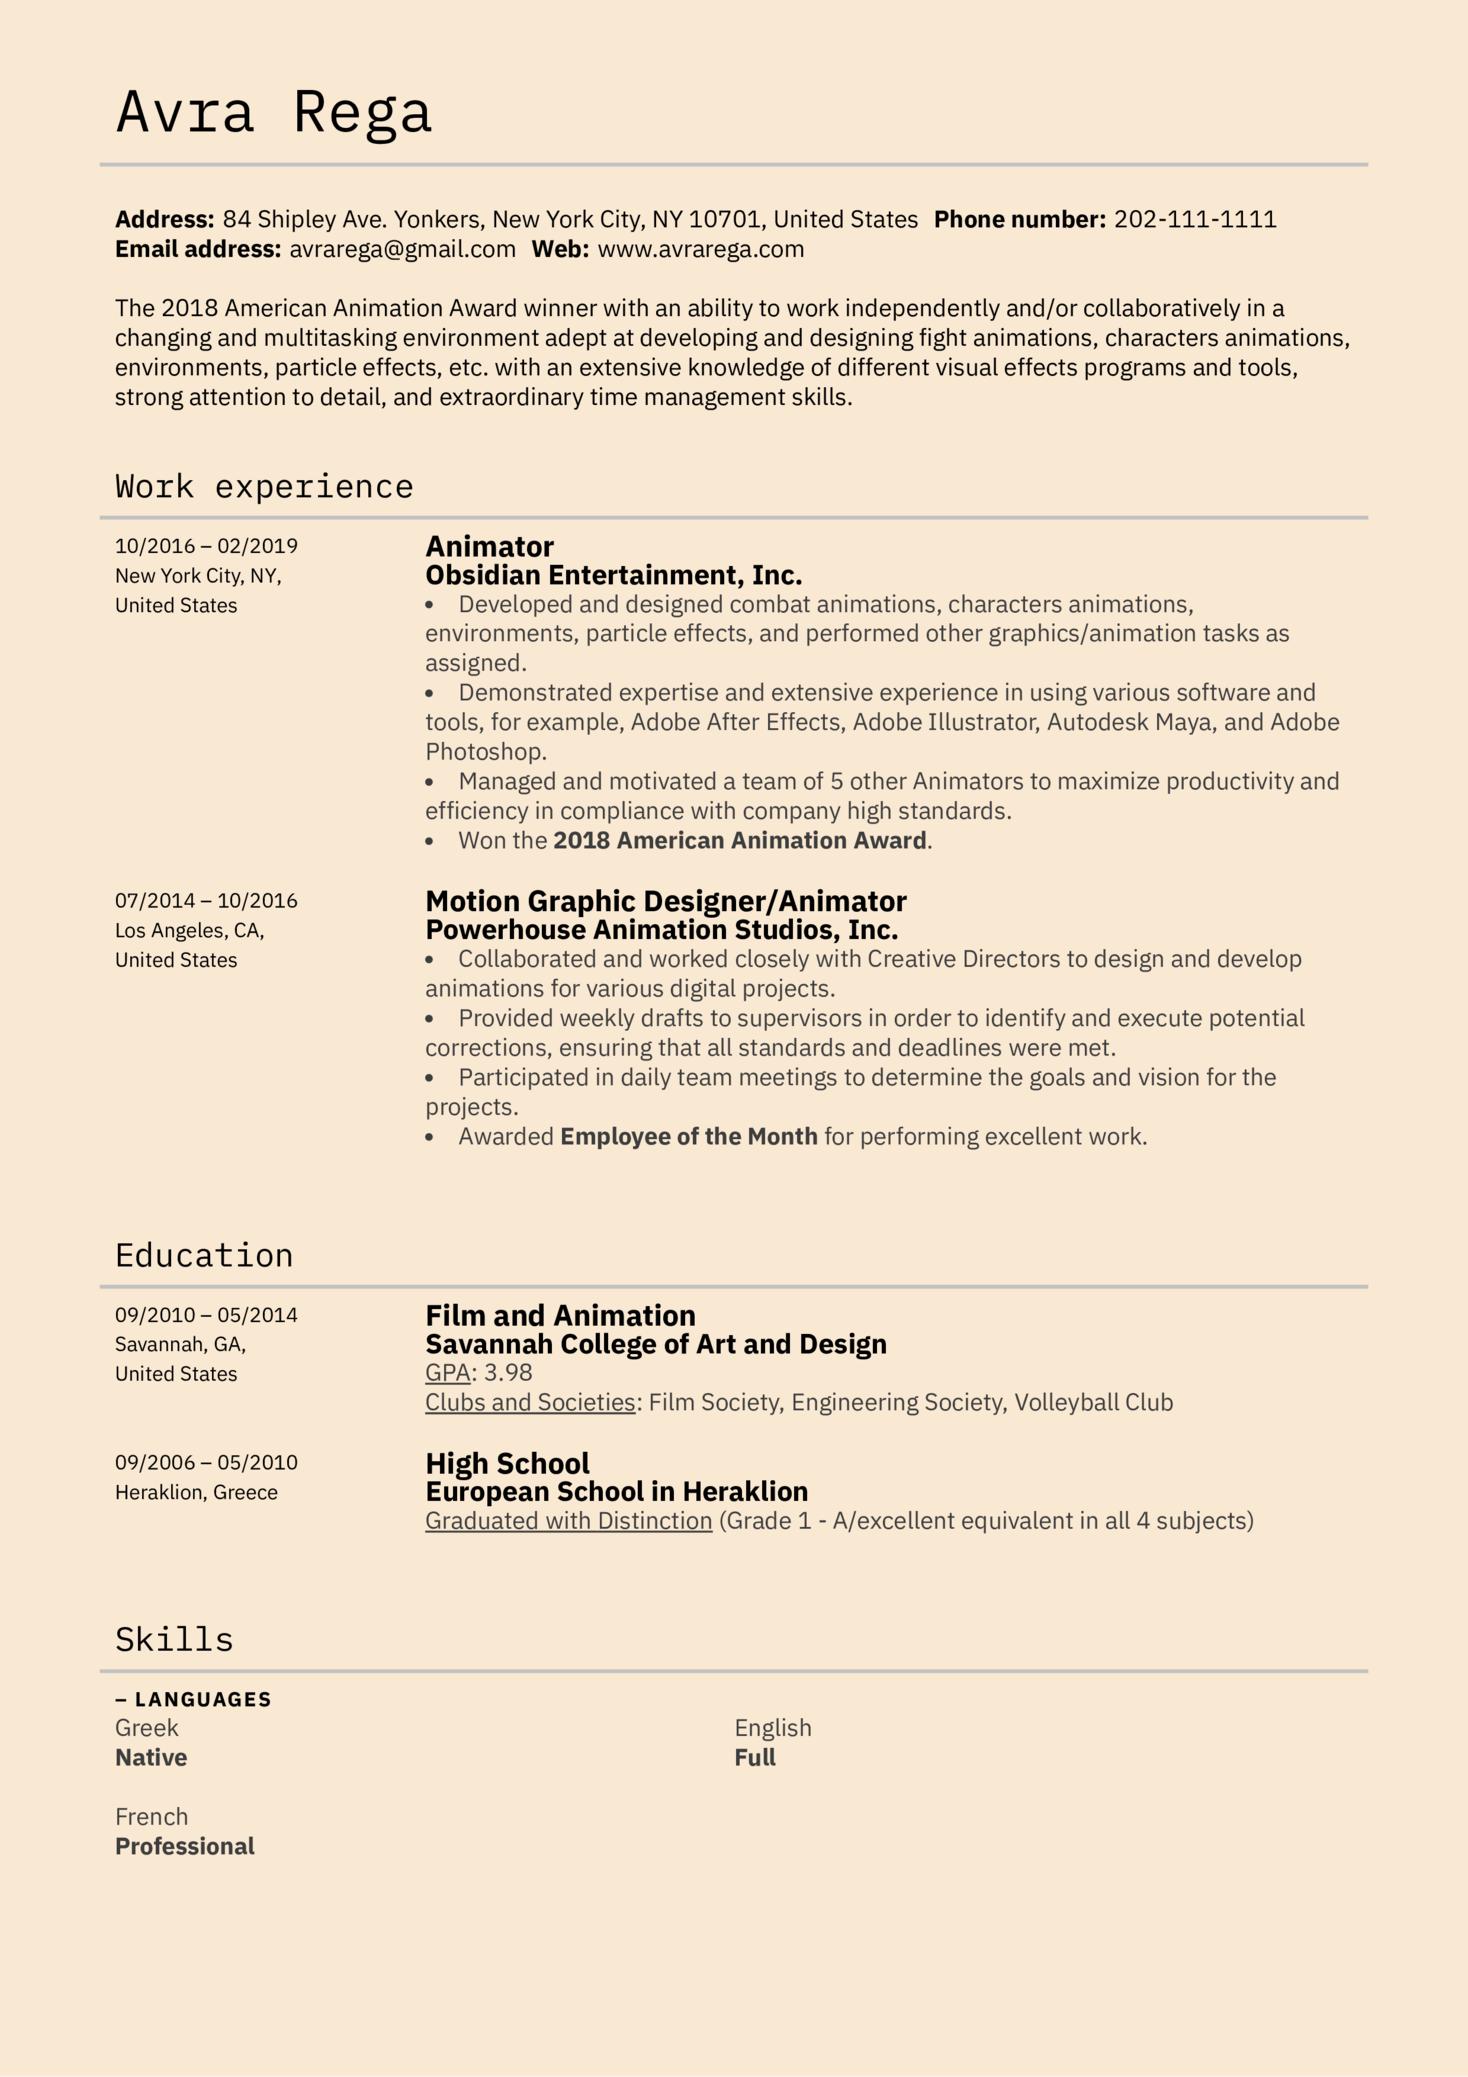 Animator Resume Example (Teil 1)